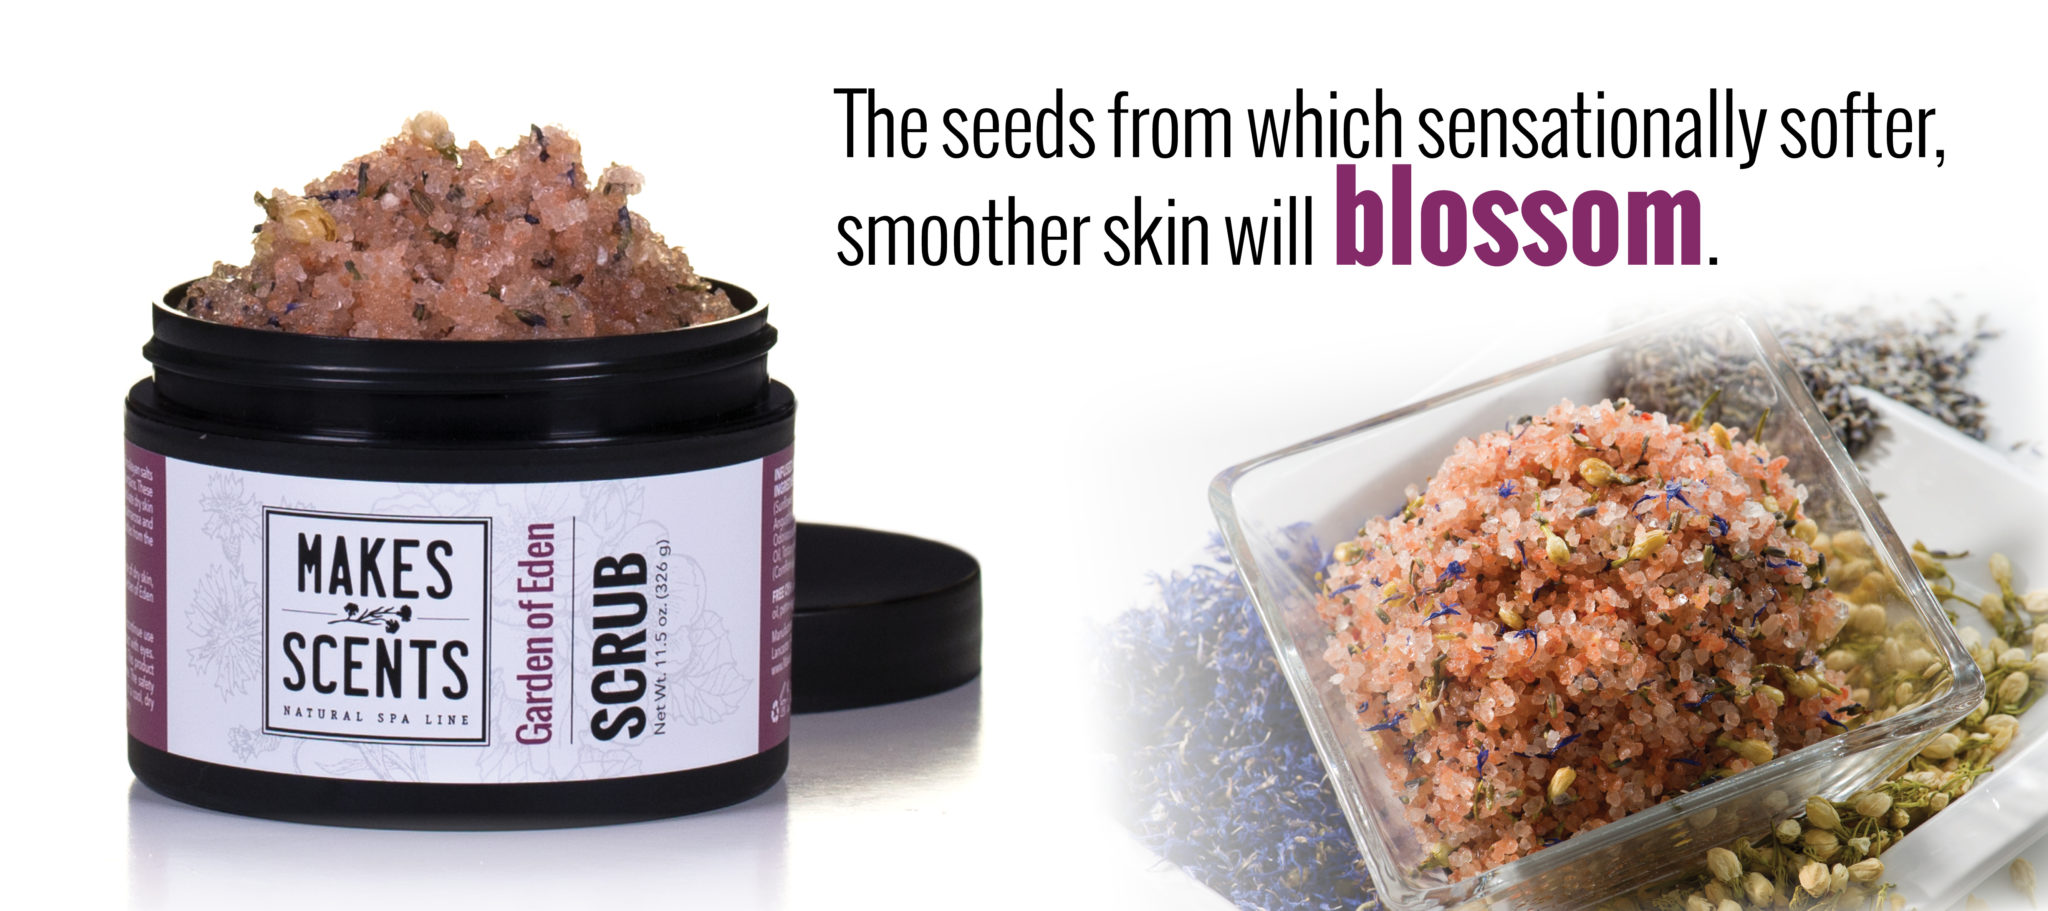 Spring Skincare - Garden of Eden   Makes Scents Natural Spa Line